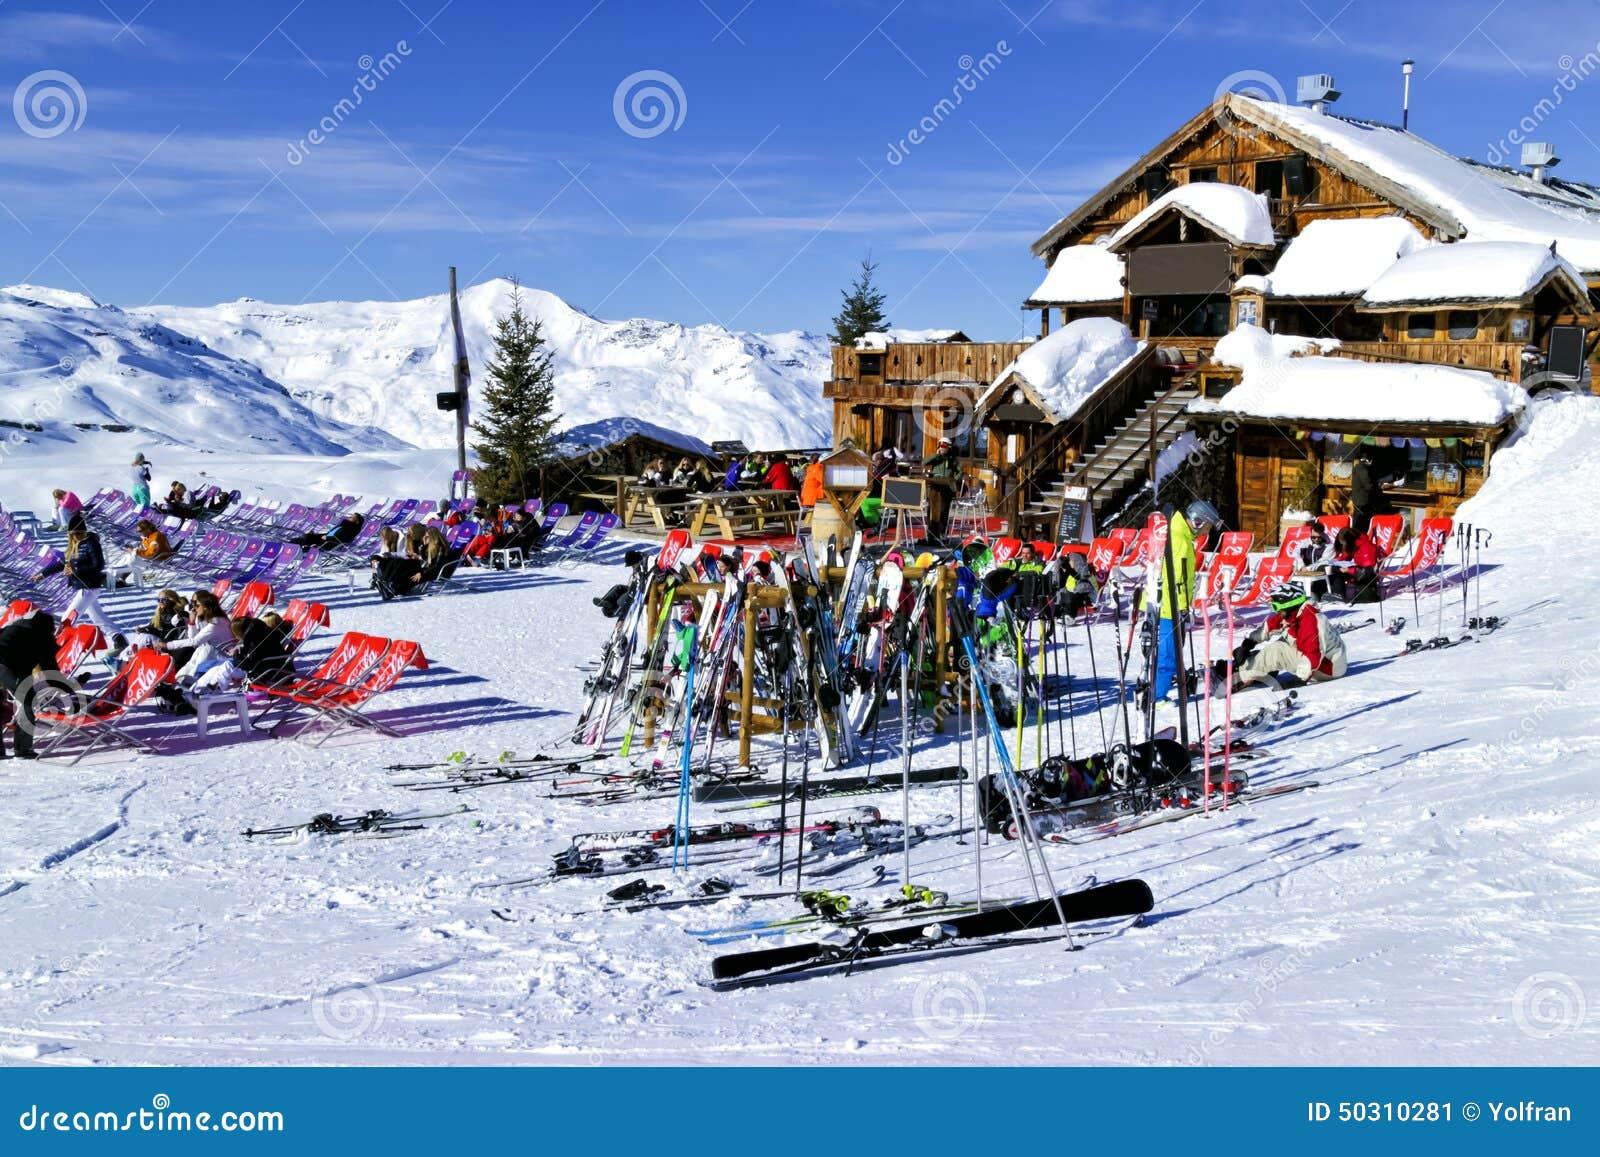 Apres Ski In A Mountain Chalet Bar Restaurant Against